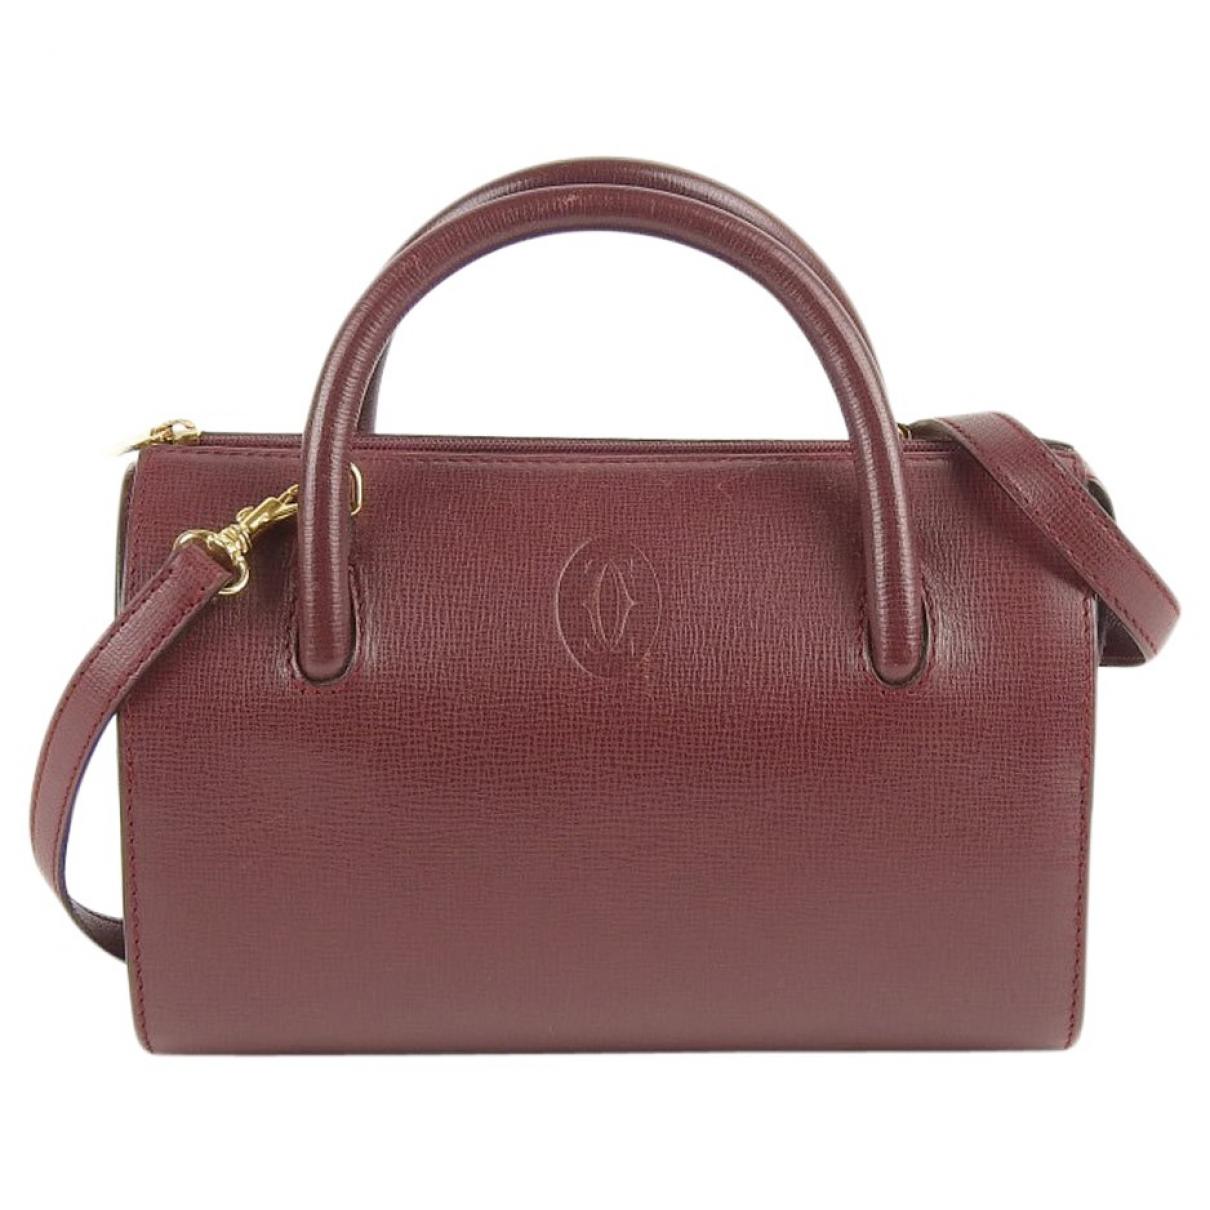 Cartier \N Red Leather handbag for Women \N